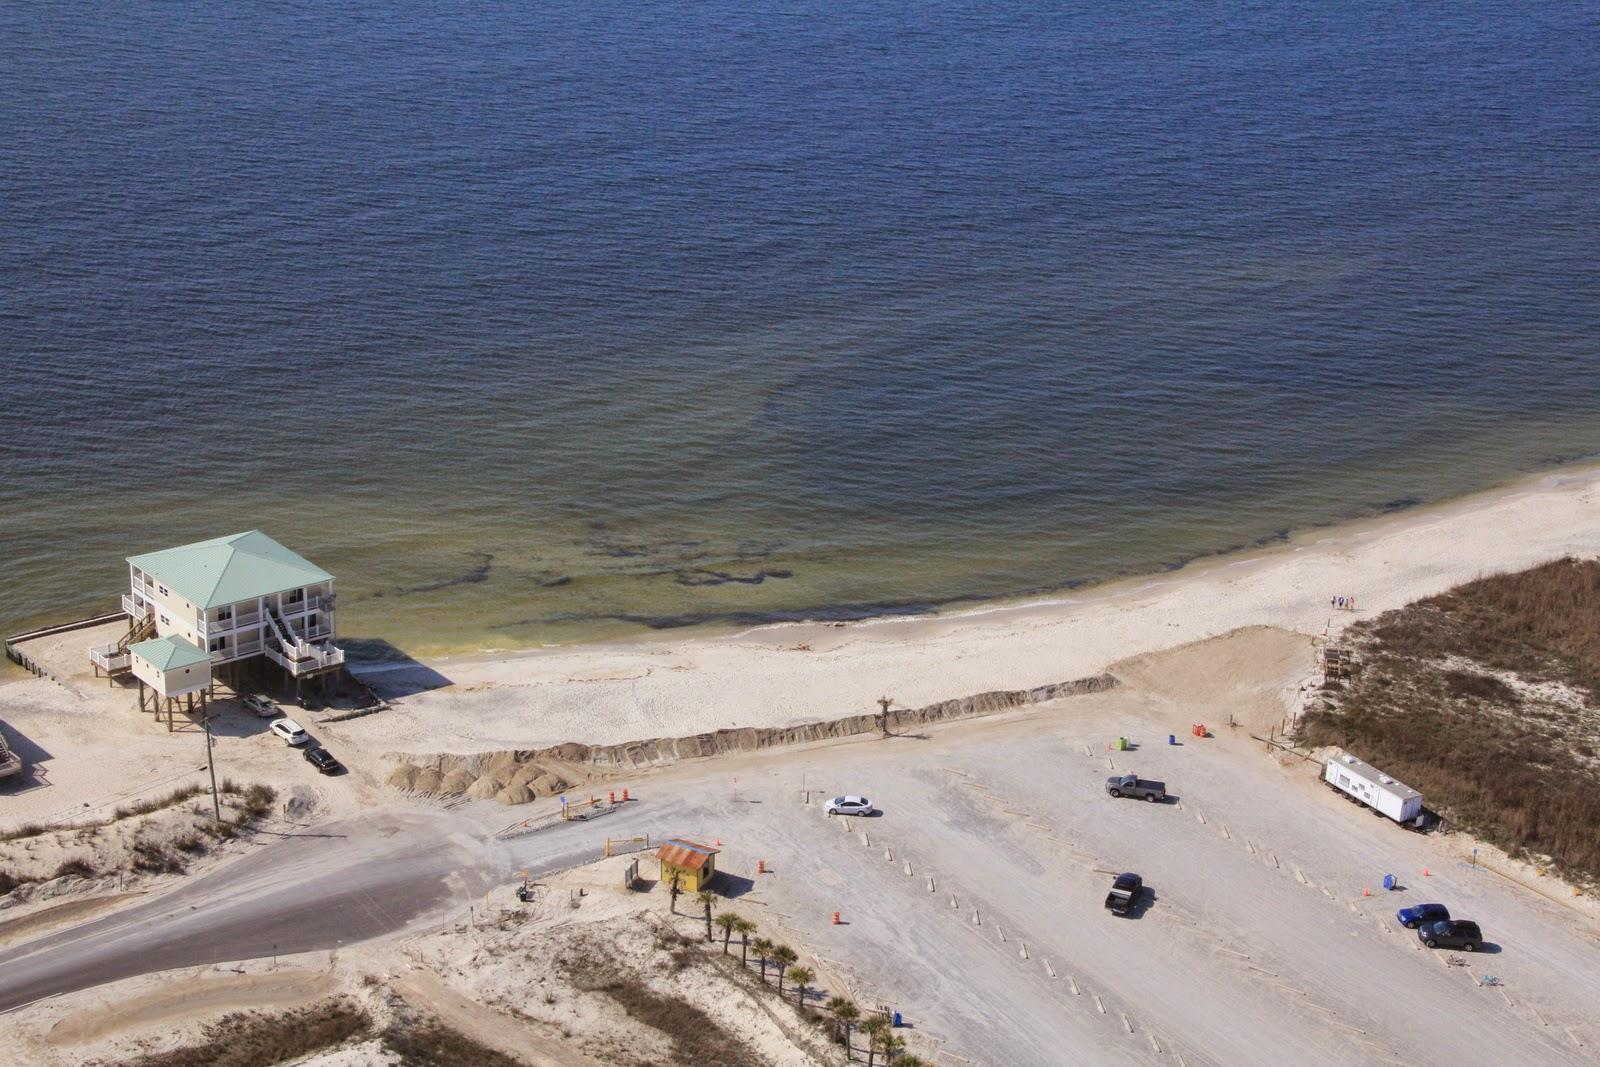 Img 5734 Erosion West End Dauphin Island